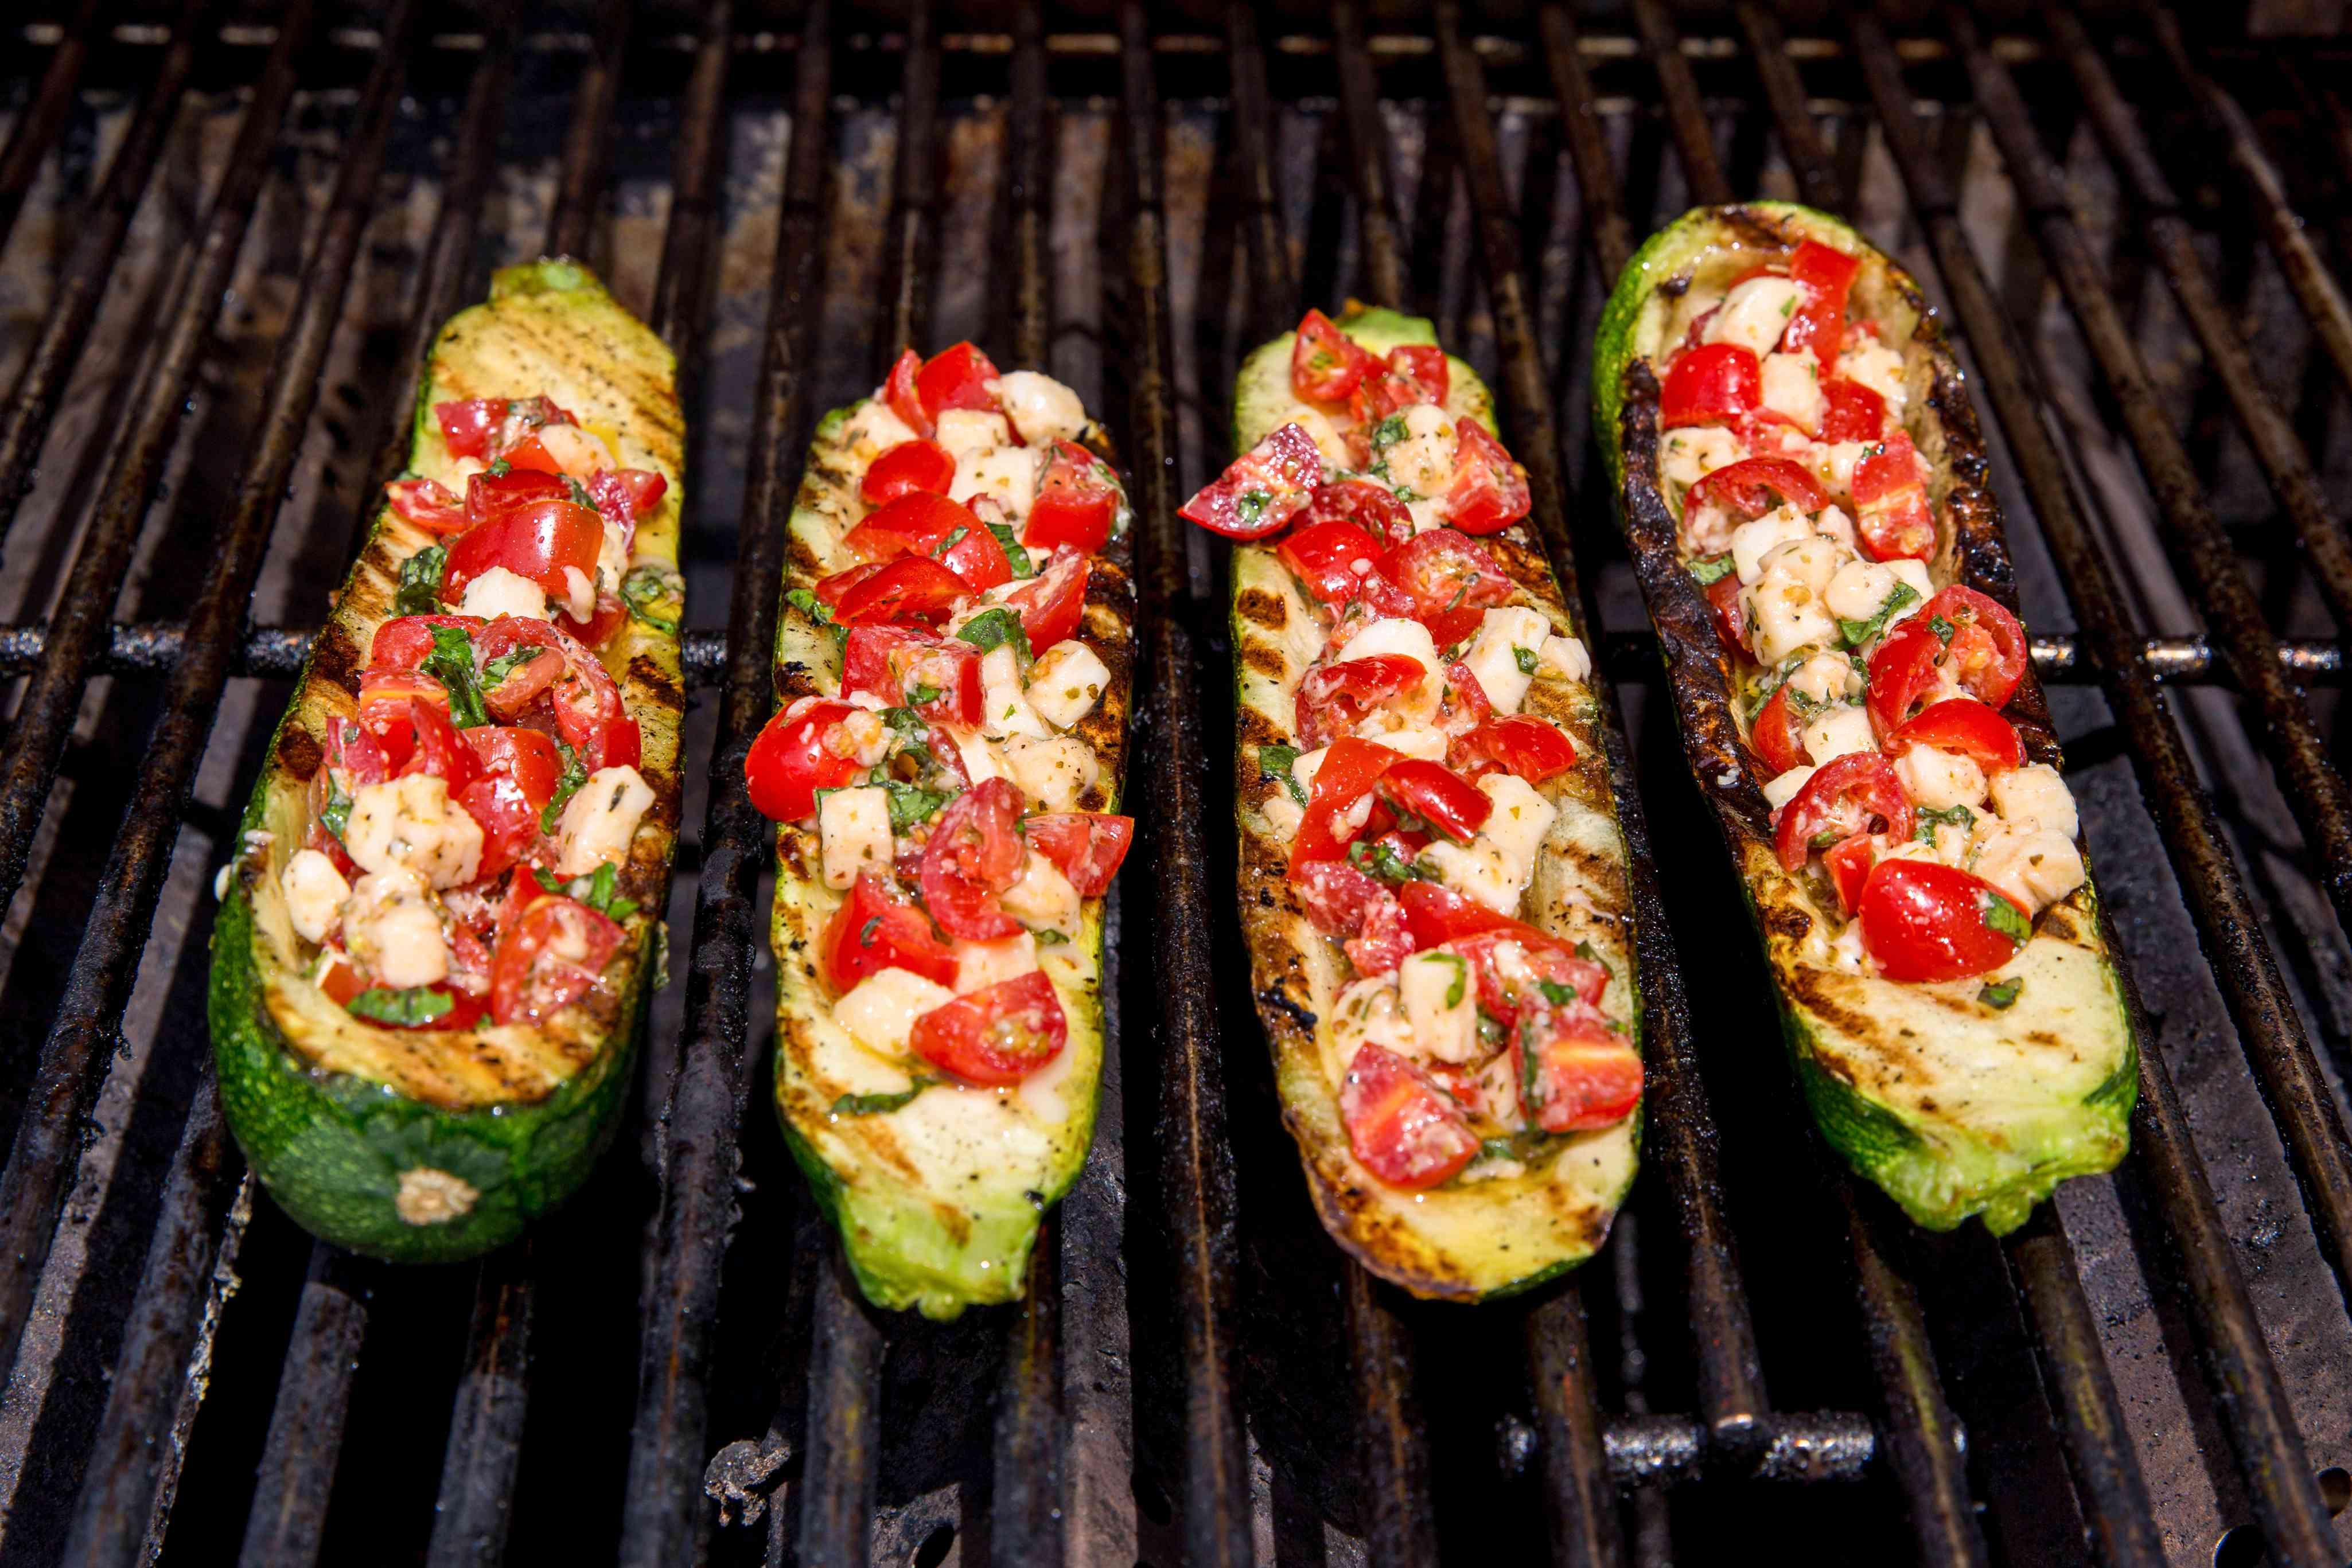 Stuffed zucchini boats on the grill.